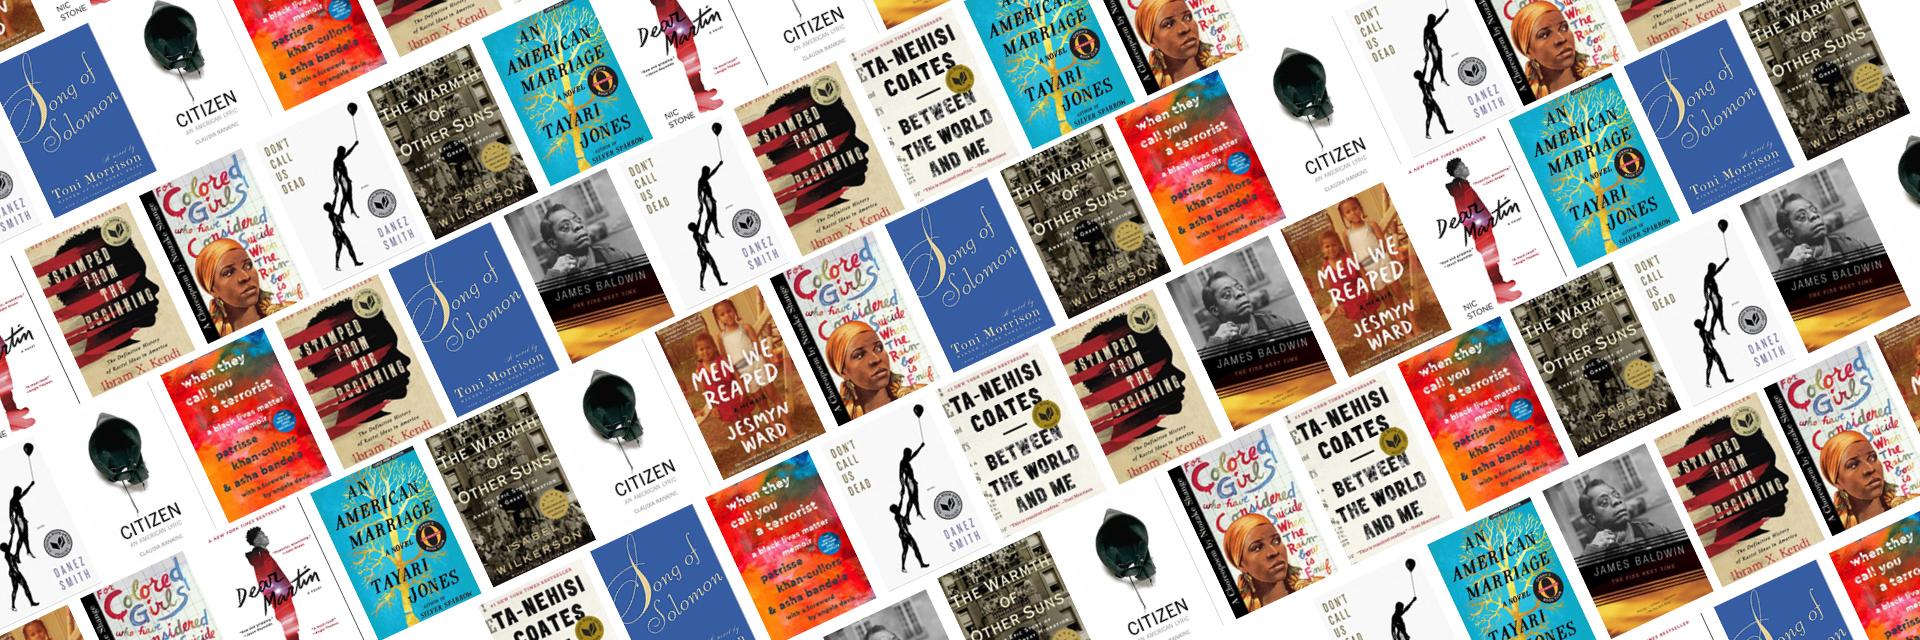 Black Literature Reading List Book Covers